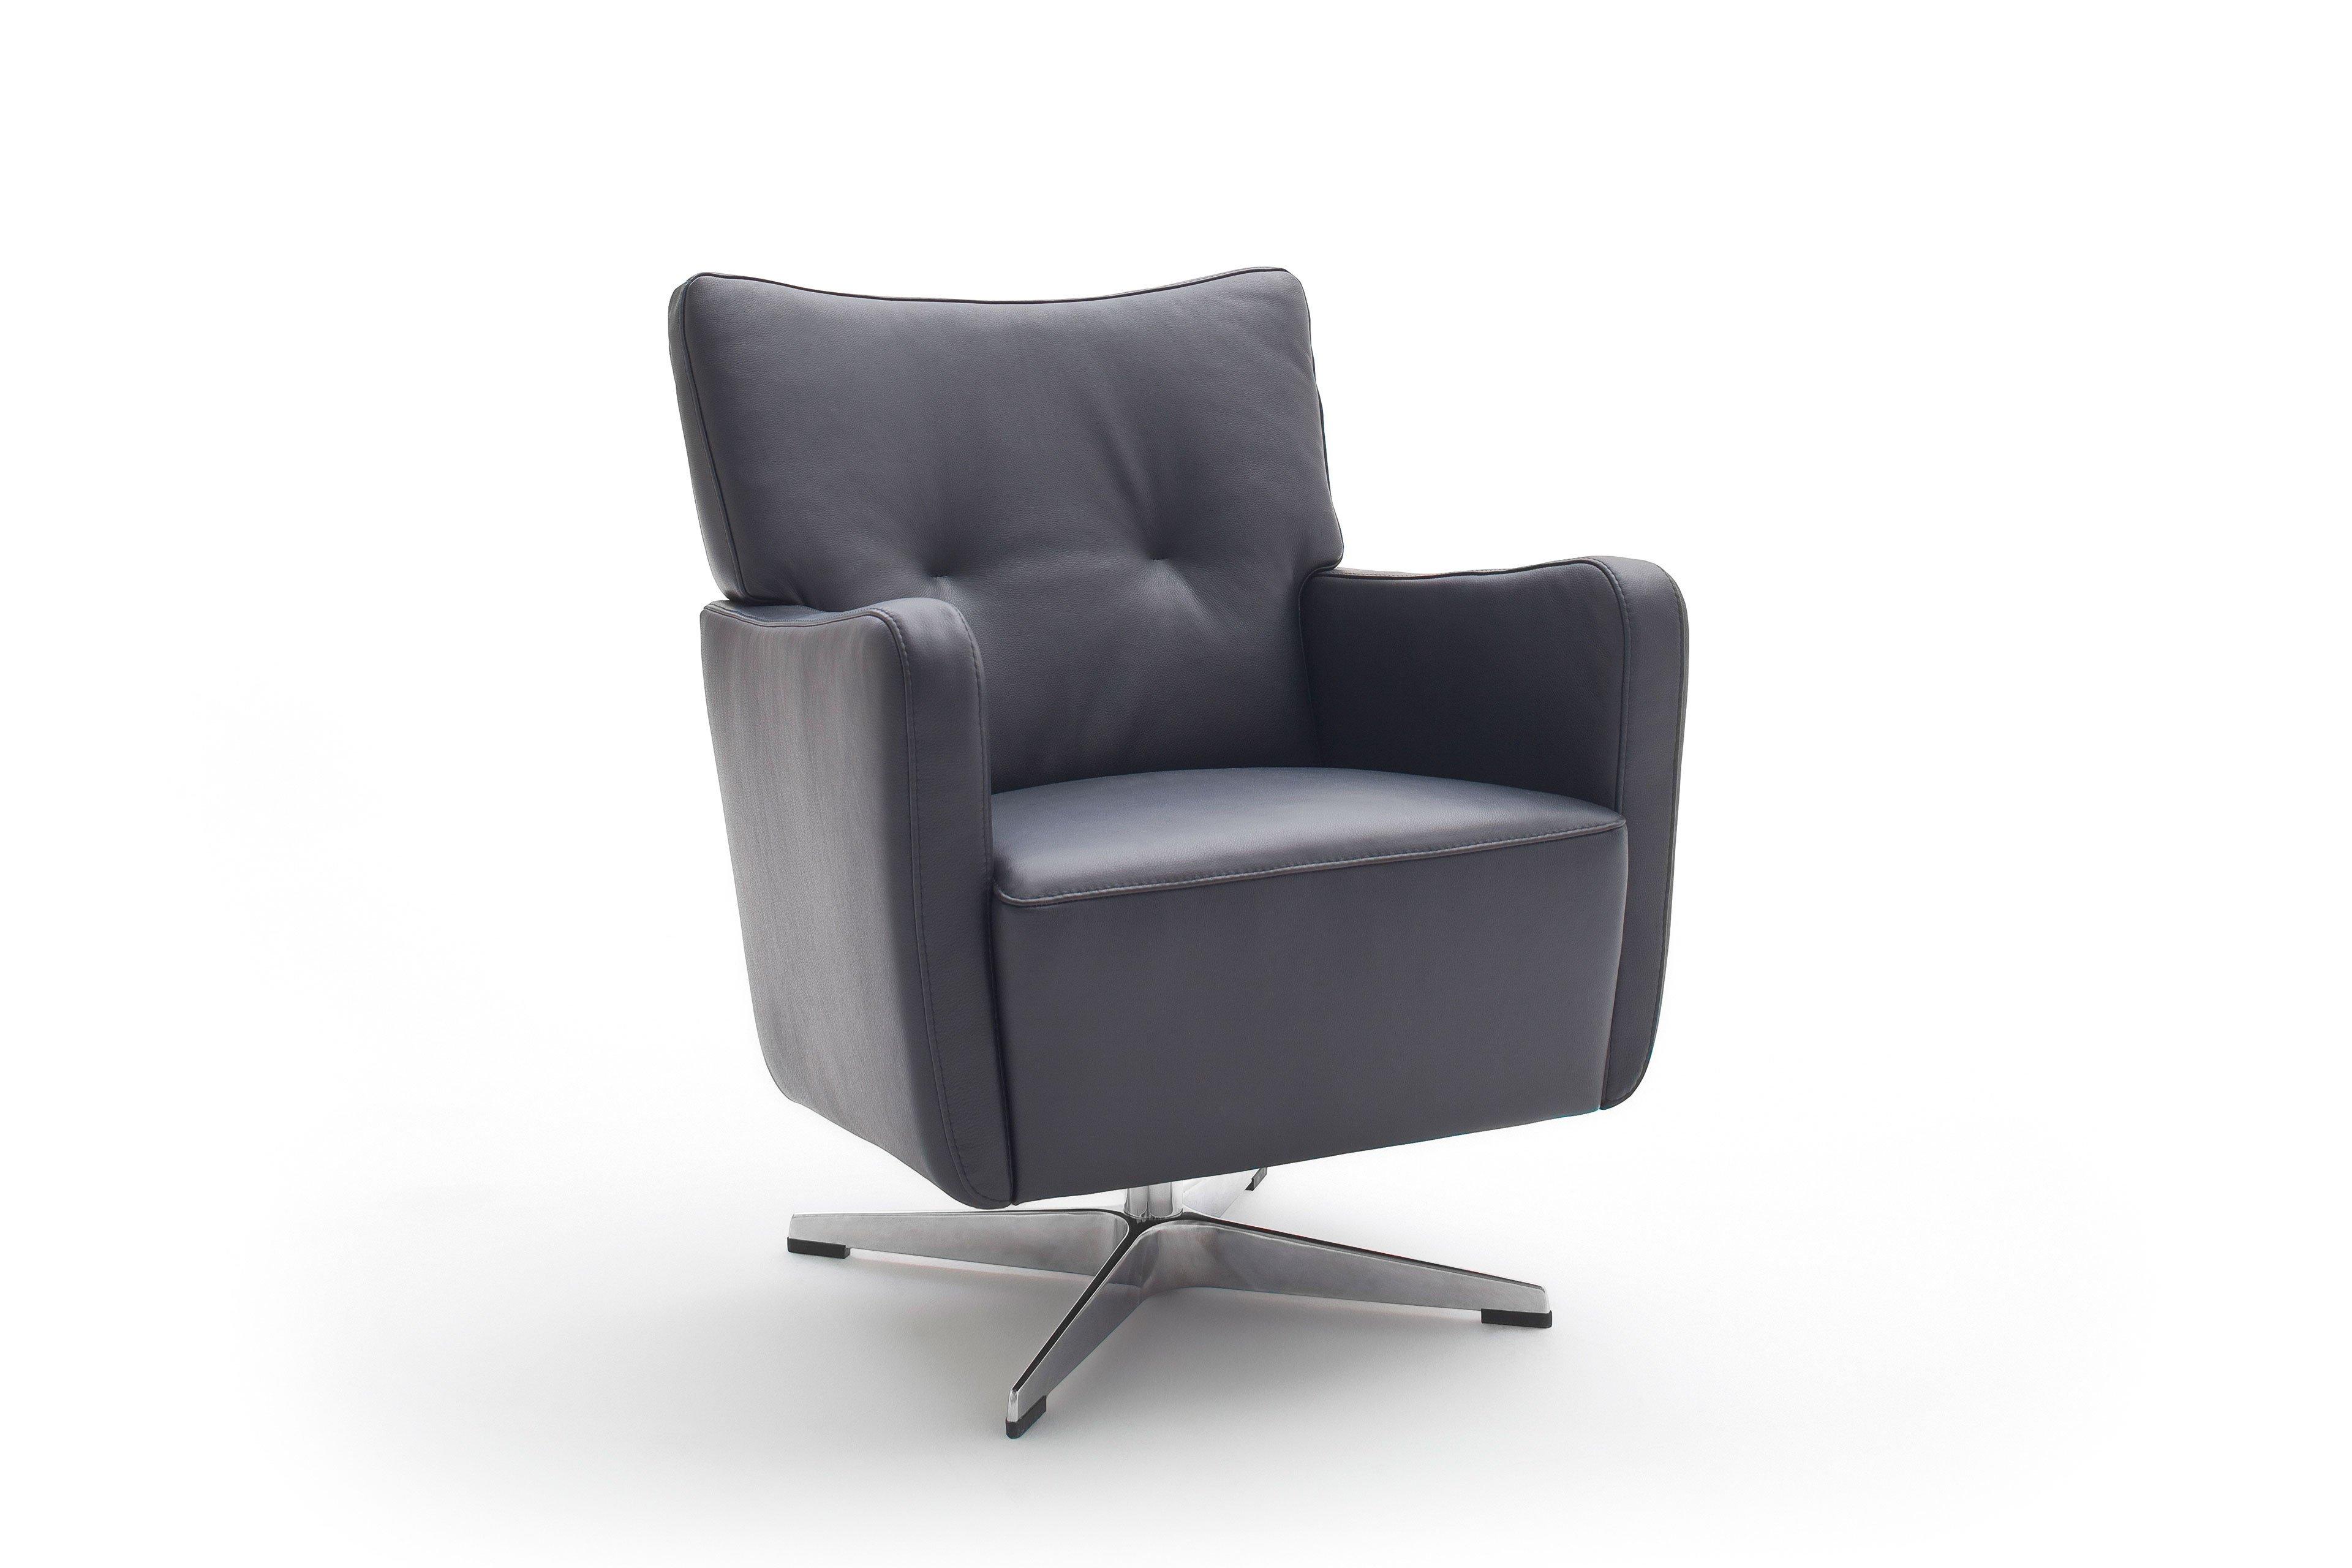 dfm polsterm bel maxim drehsessel schwarz m bel letz ihr online shop. Black Bedroom Furniture Sets. Home Design Ideas